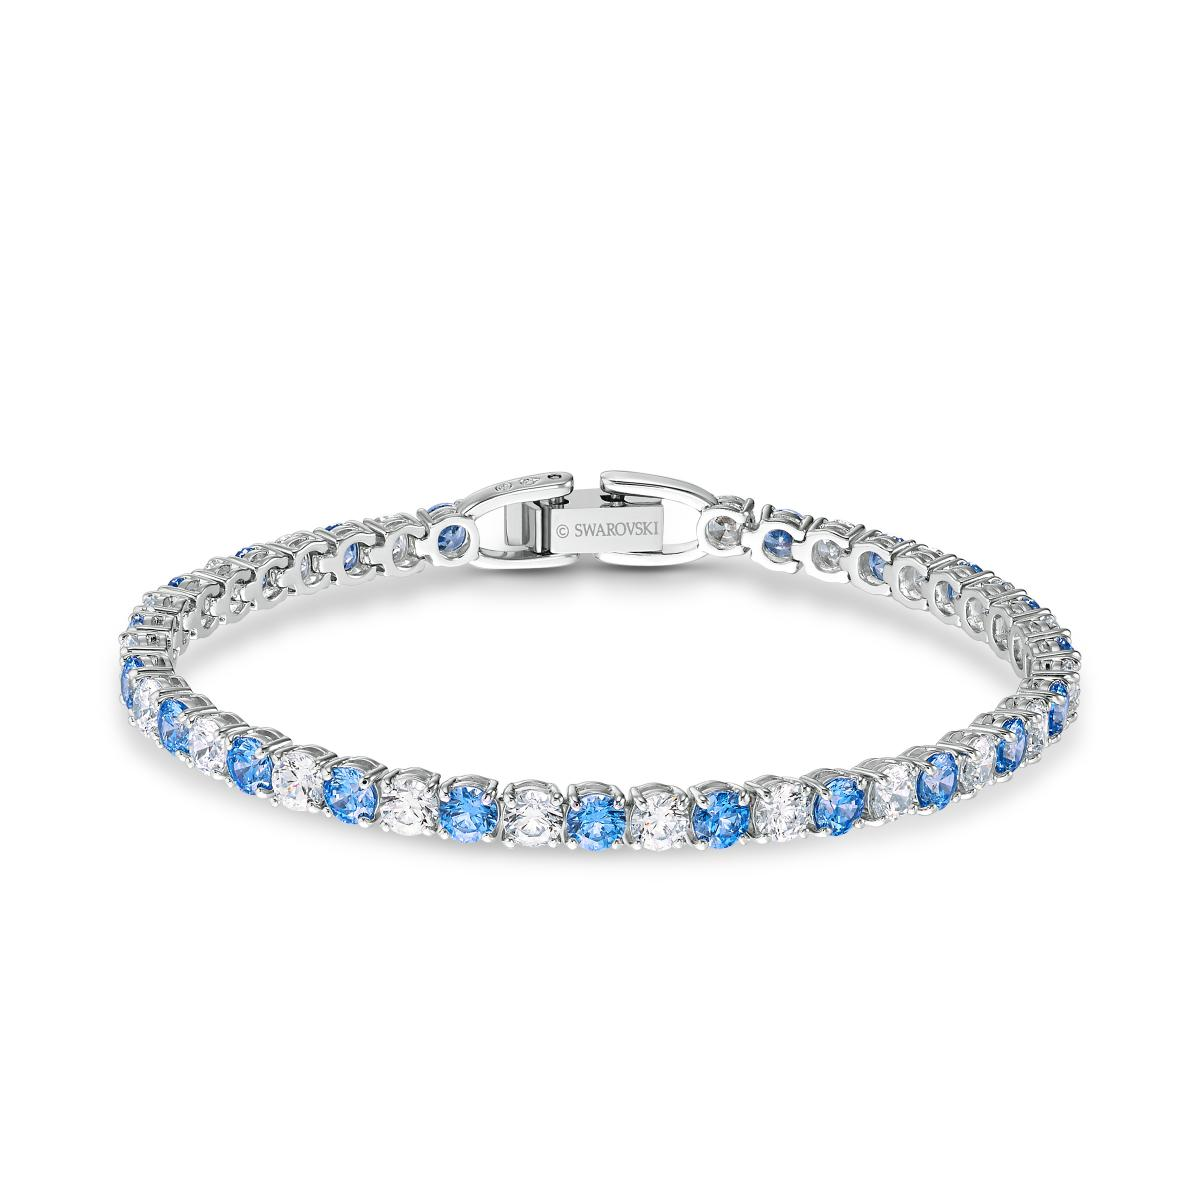 BRACELET Swarovski 5536469 - Bracelet Métal Argenté Chaîne Cristaux Bleu et  Blanc Femme